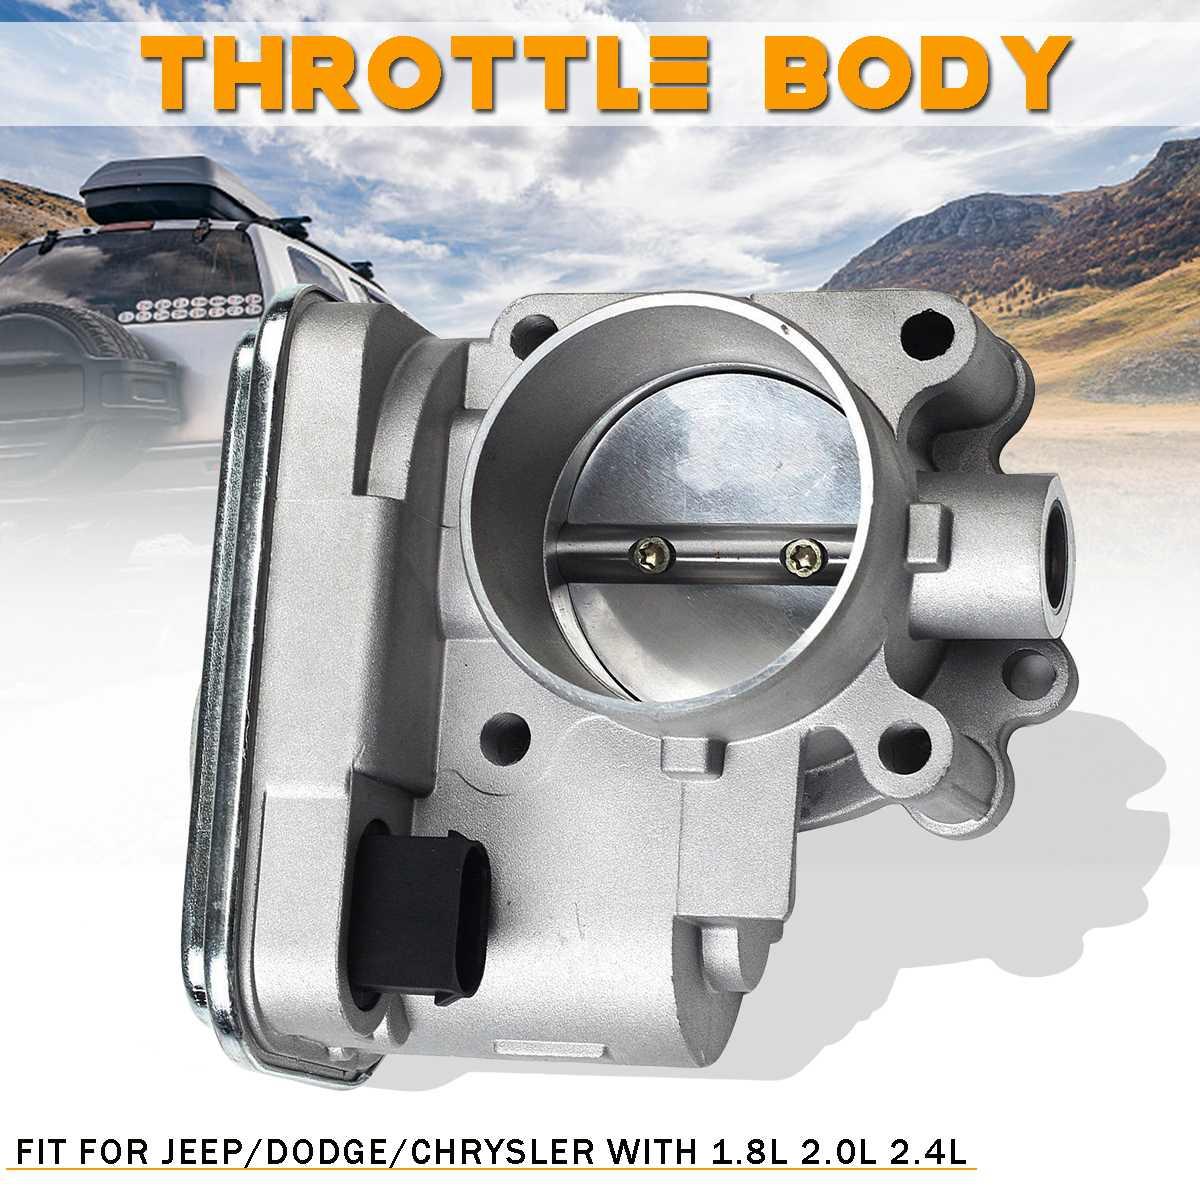 Komplette Drosselklappengehäuse Für Jeep/Chrysler/Dodge/Kompass/Kaliber 4884551AA 04891735AC Auto Ersatz Teile 1.8L 2.0L 2.4L